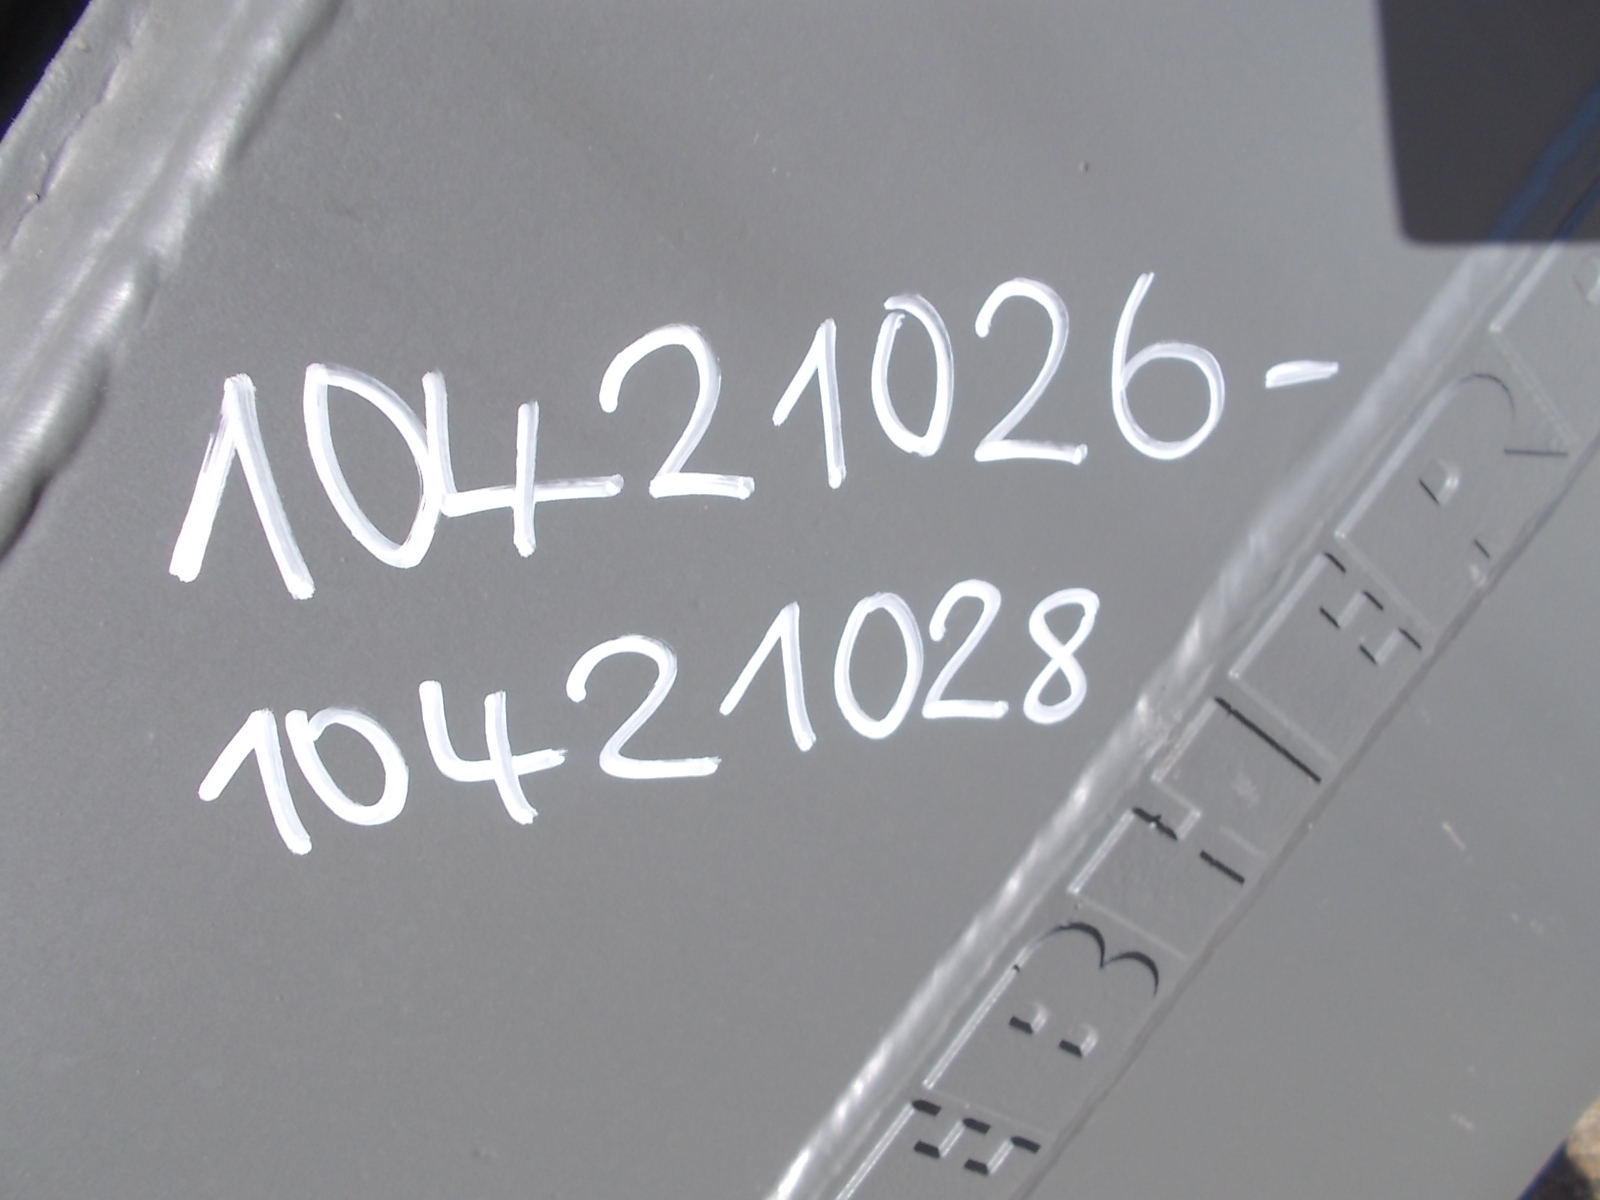 SG 25B, 800 mm, 0,55 m³ (10421026-028)_ (2).JPG